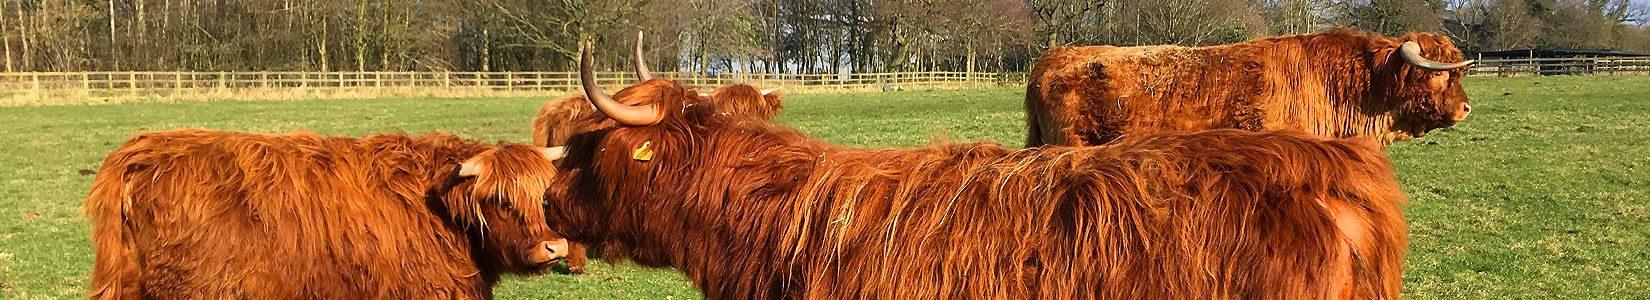 pedigree highland cattle